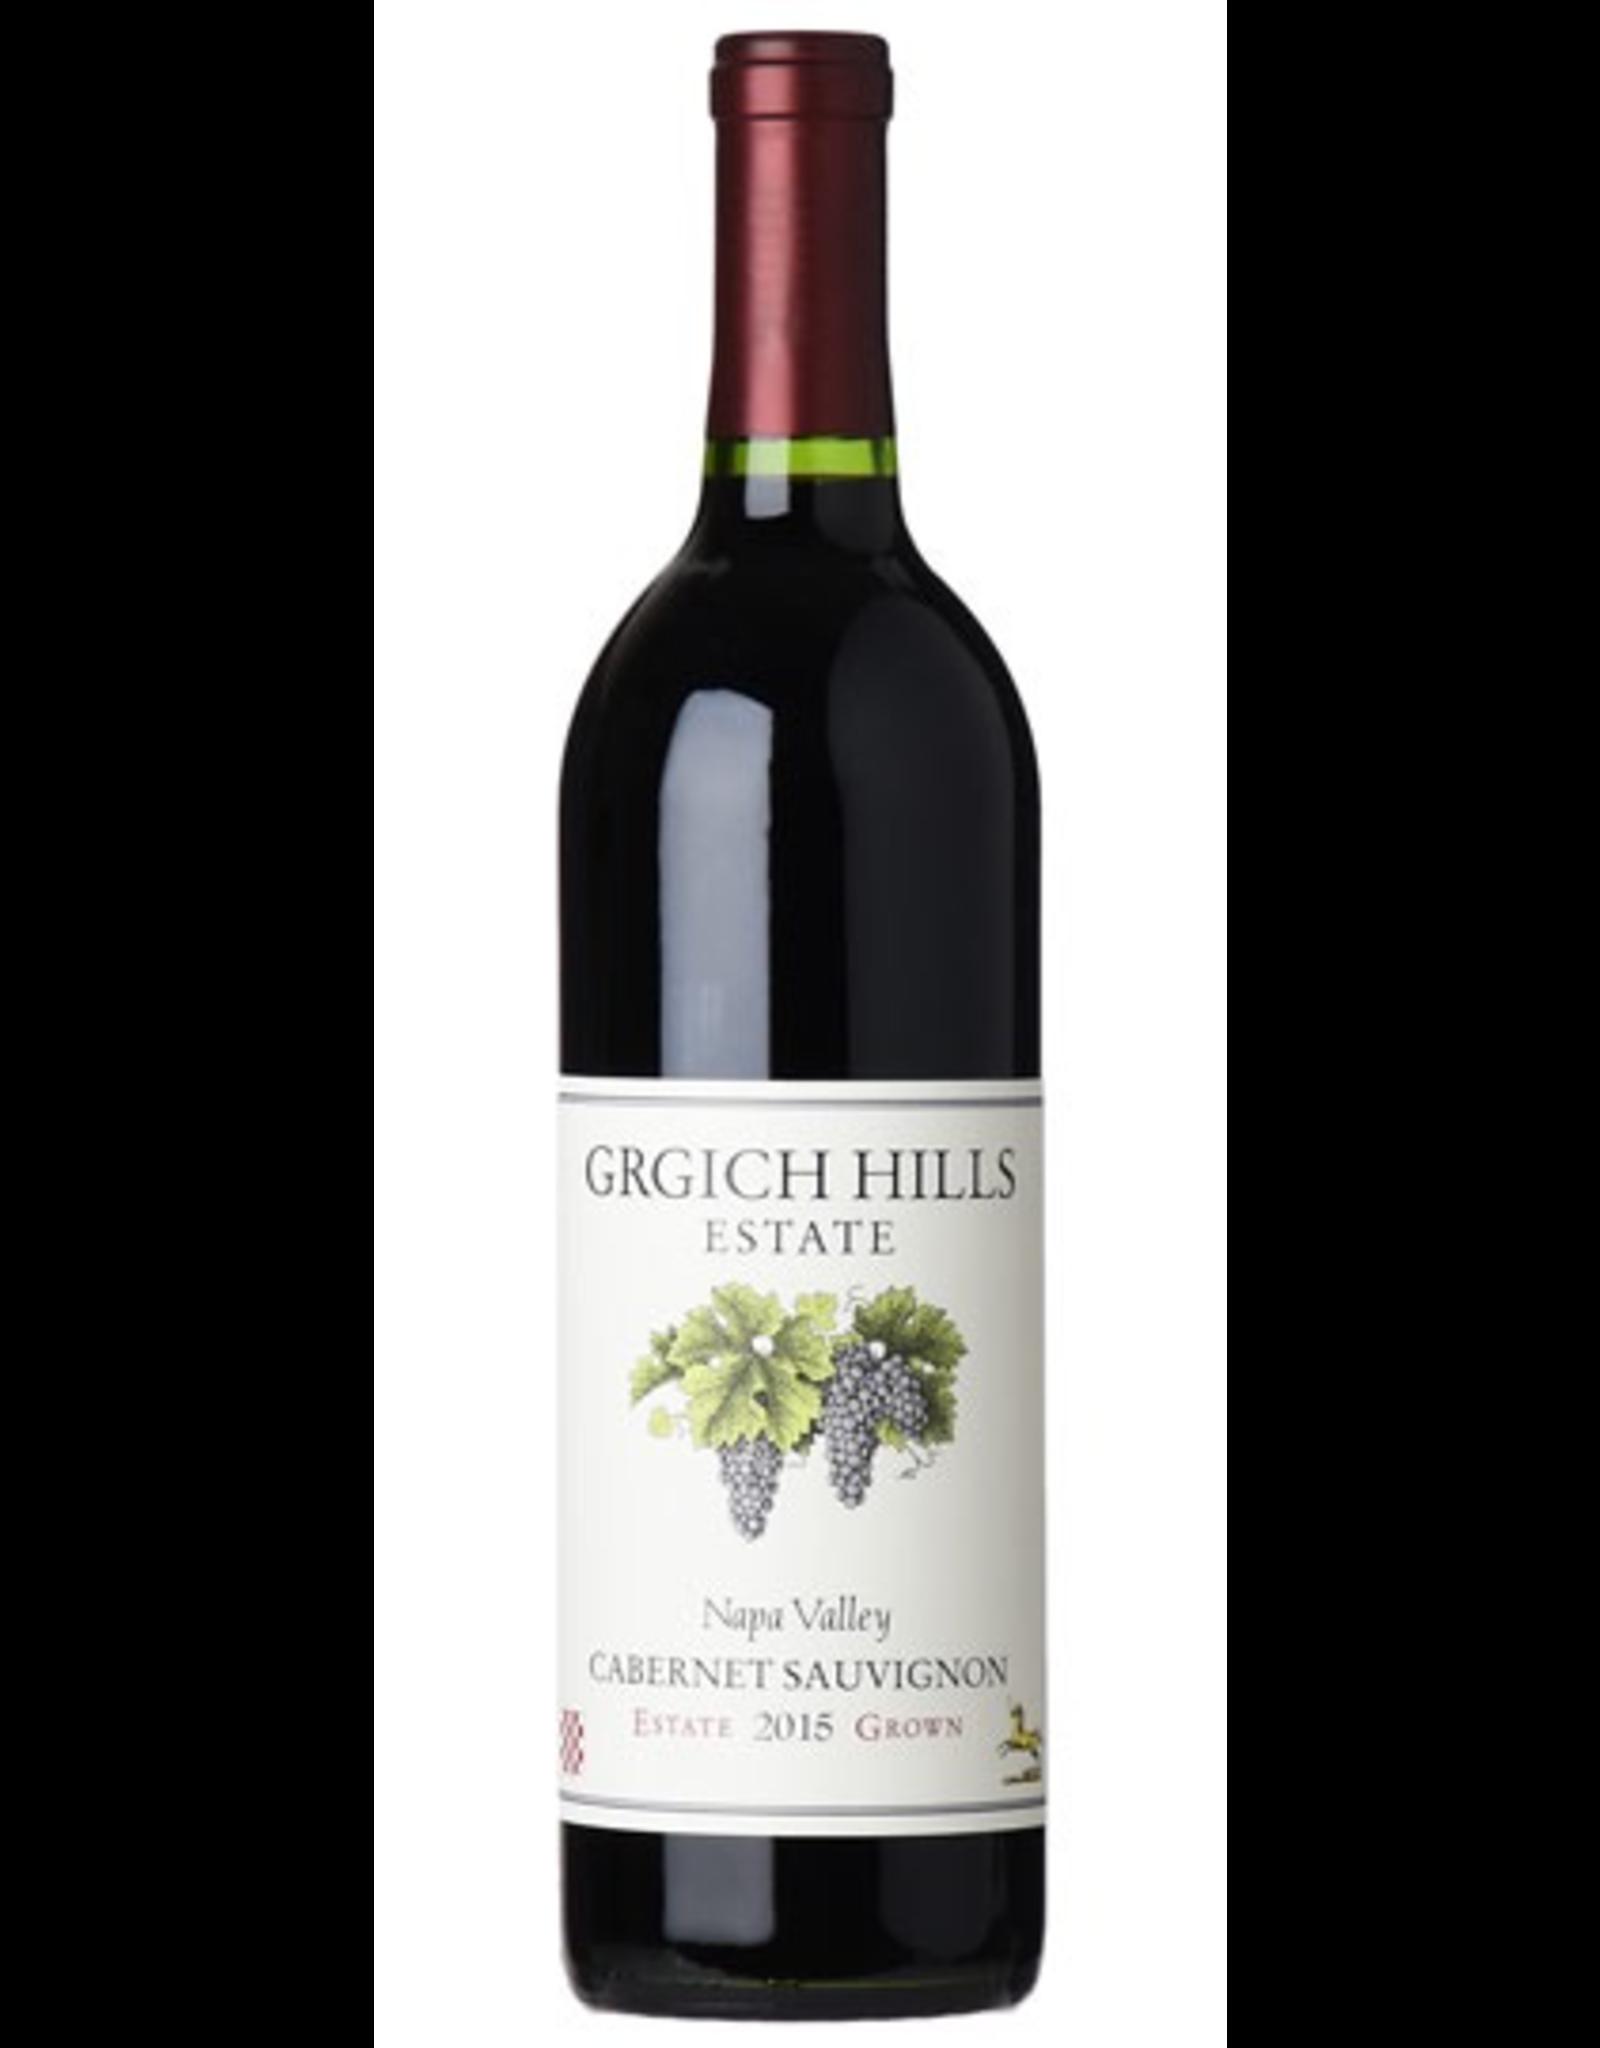 Red Wine 2015, Grgich Hills, Cabernet Sauvignon, Rutherford, Napa Valley, California, 14.8% Alc, CTnr